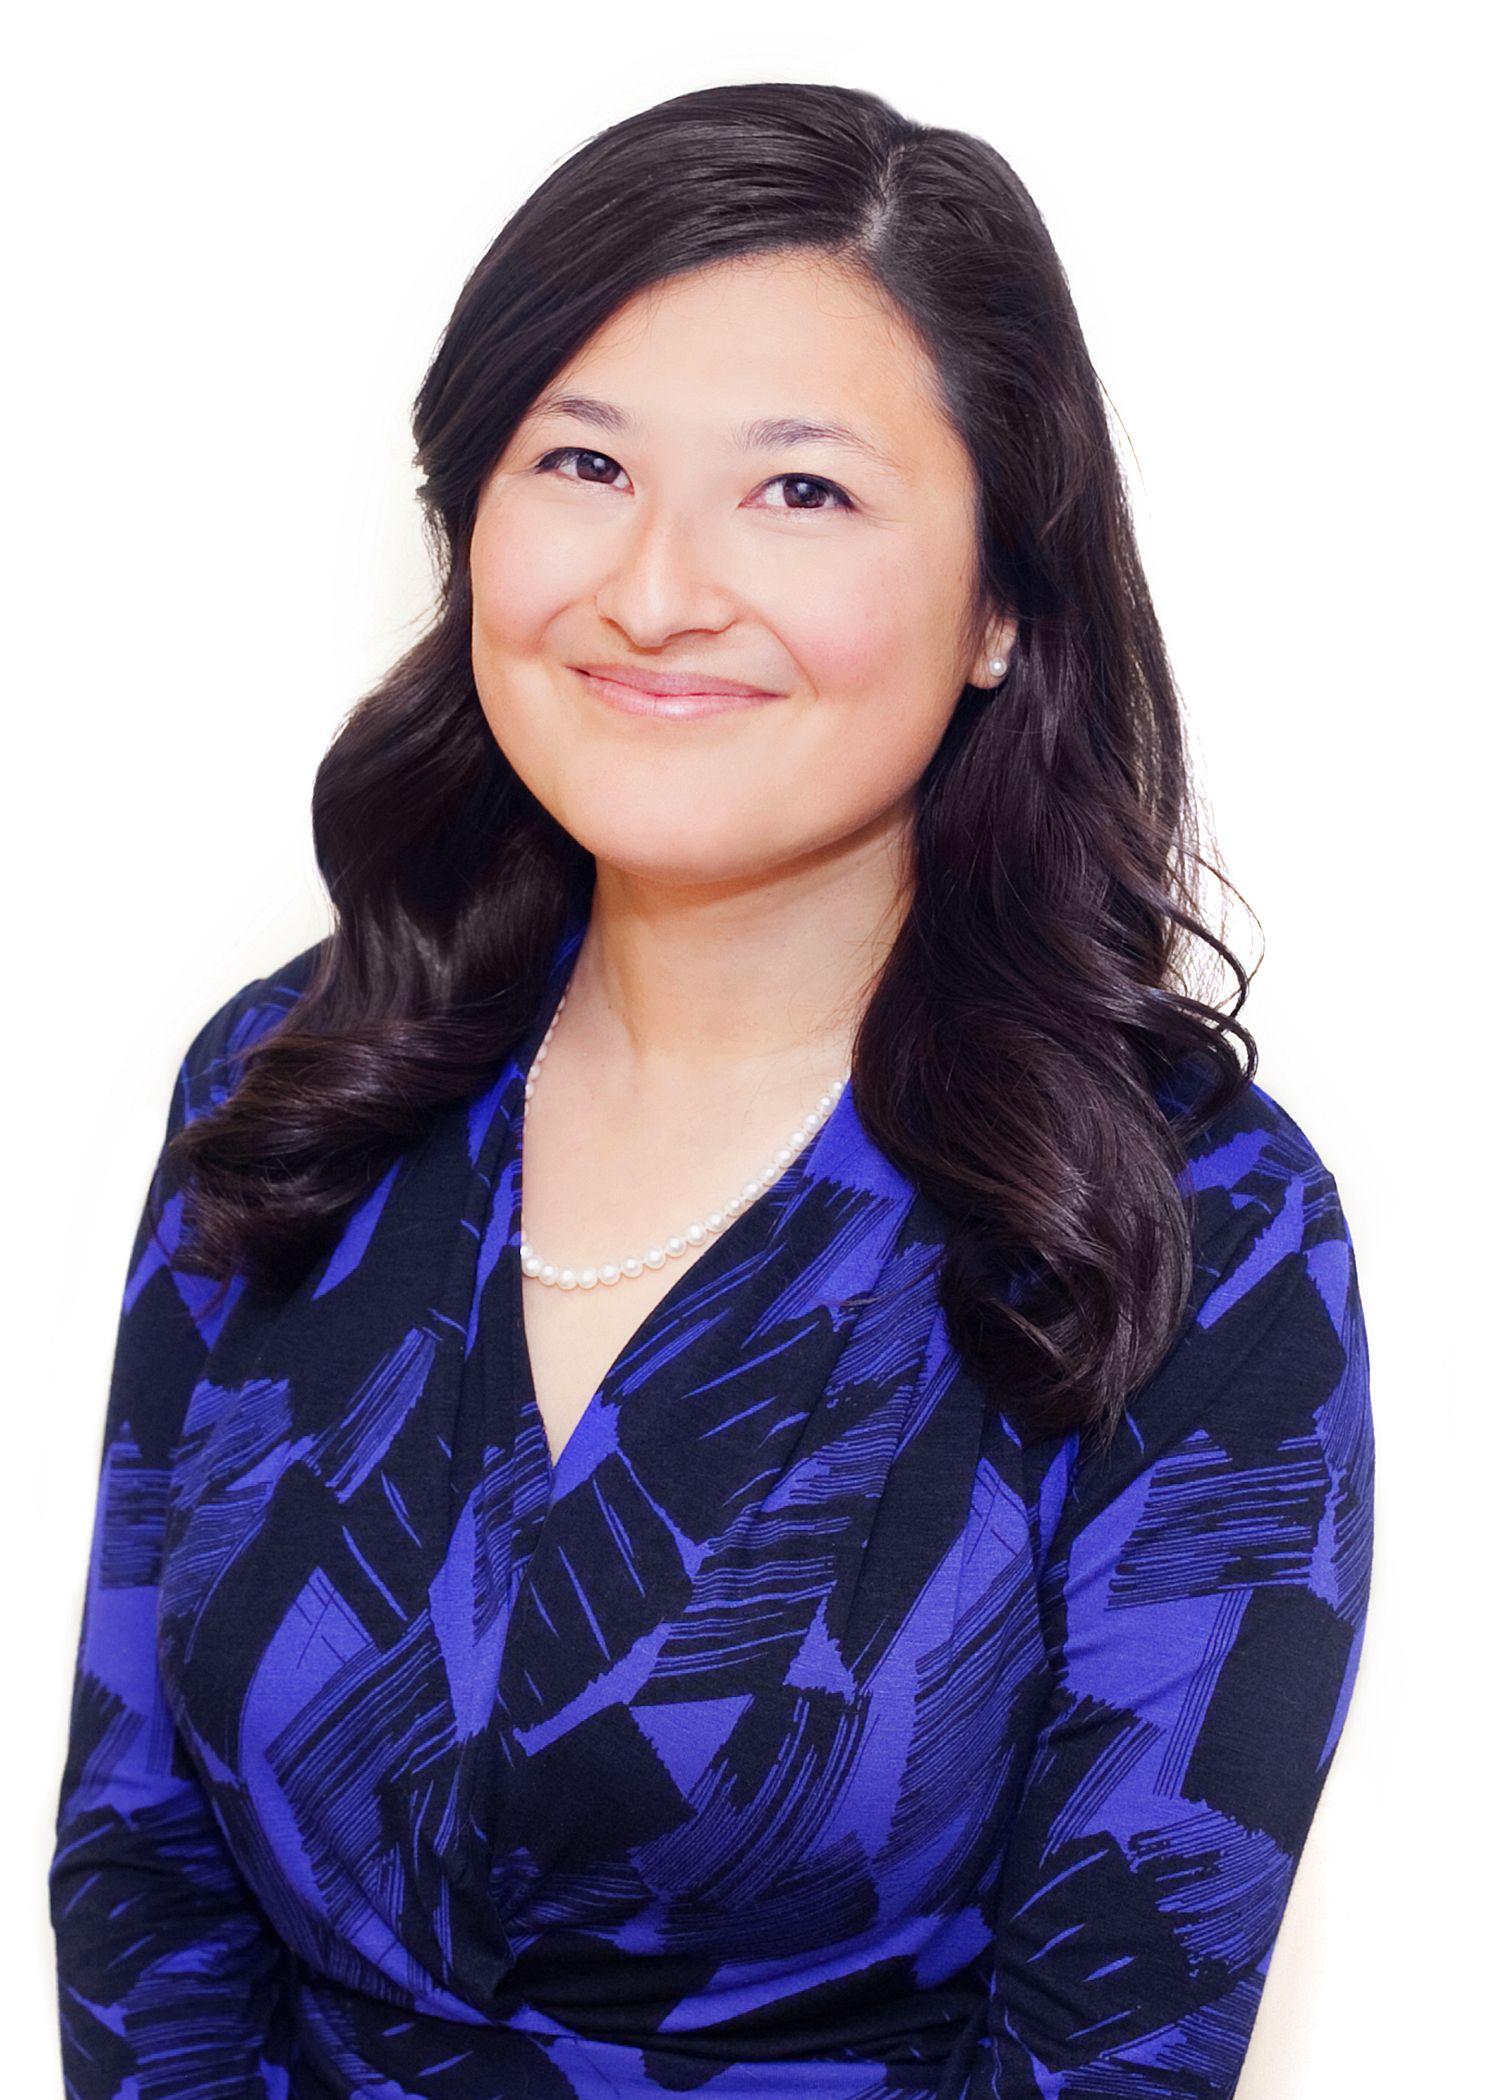 Andrea Dreskin - Receptionist at Livelihood Law